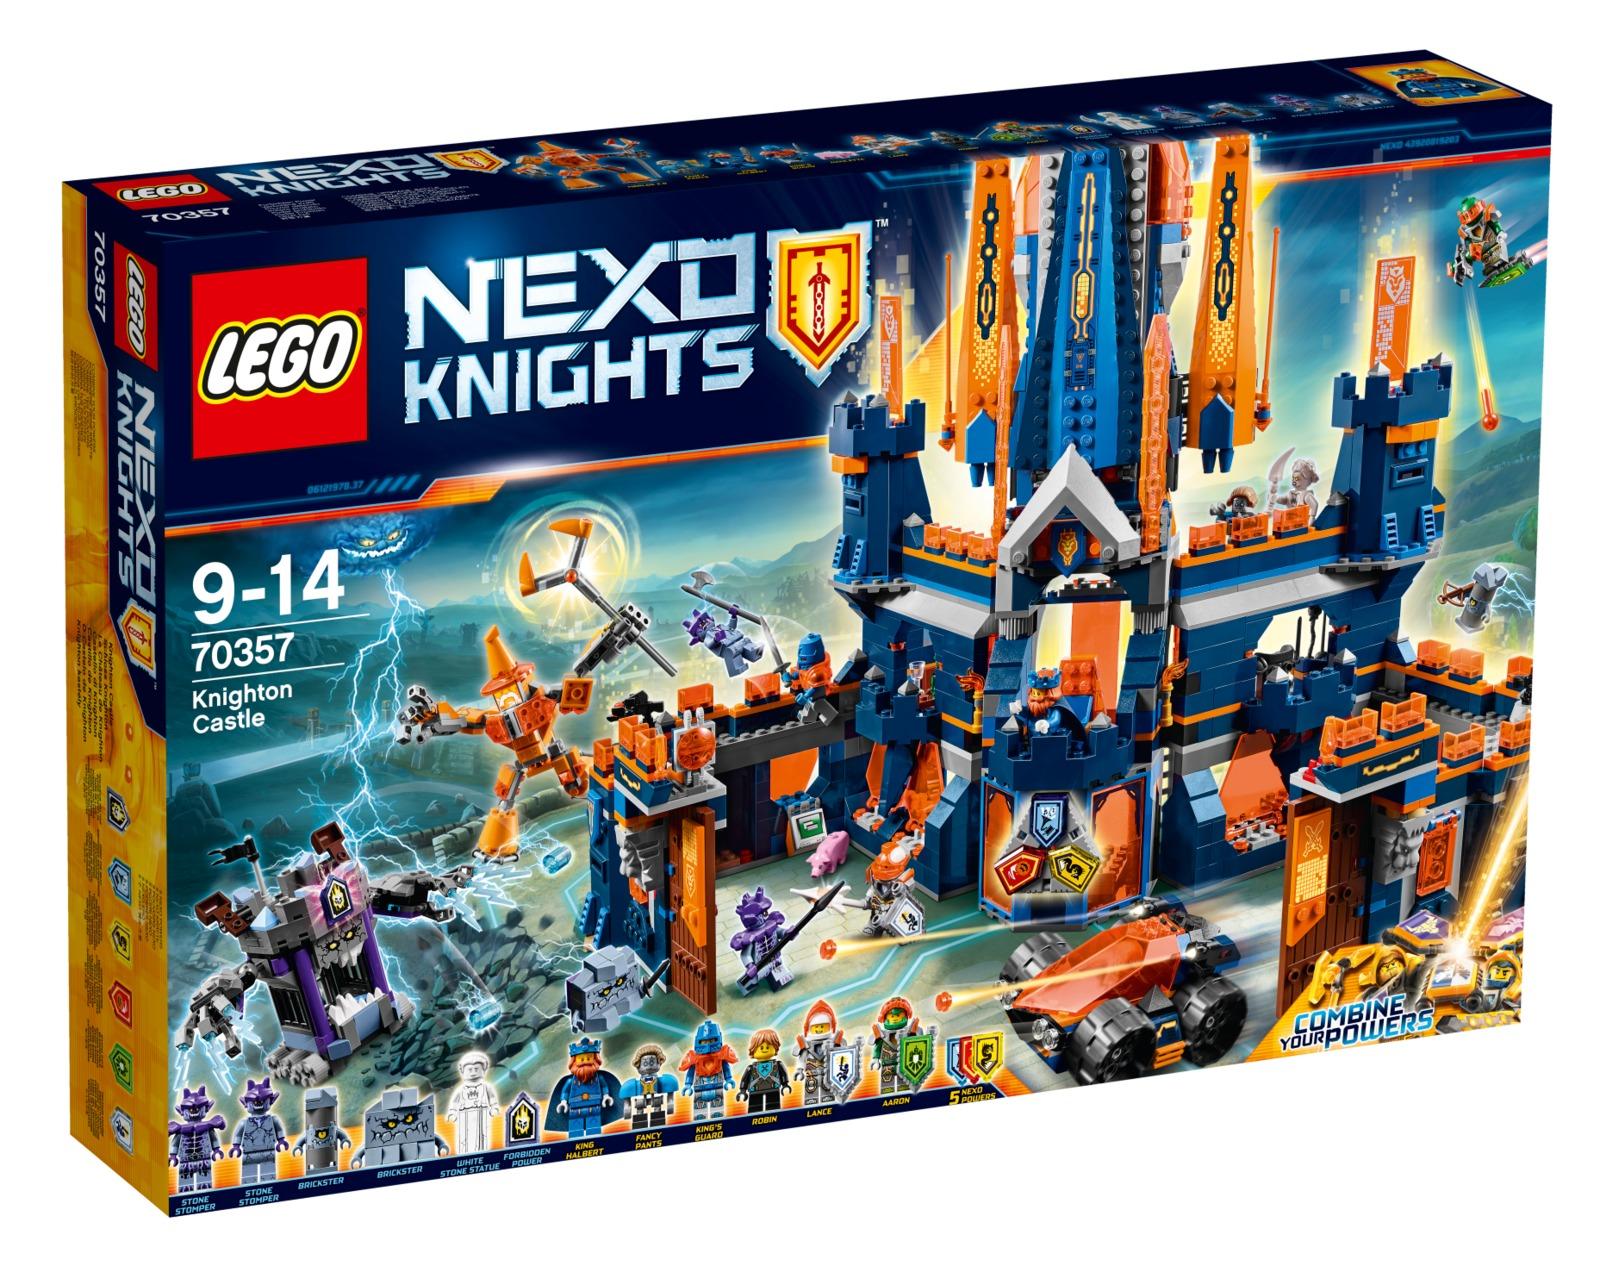 LEGO Nexo Knights - Knighton Castle (70357) image